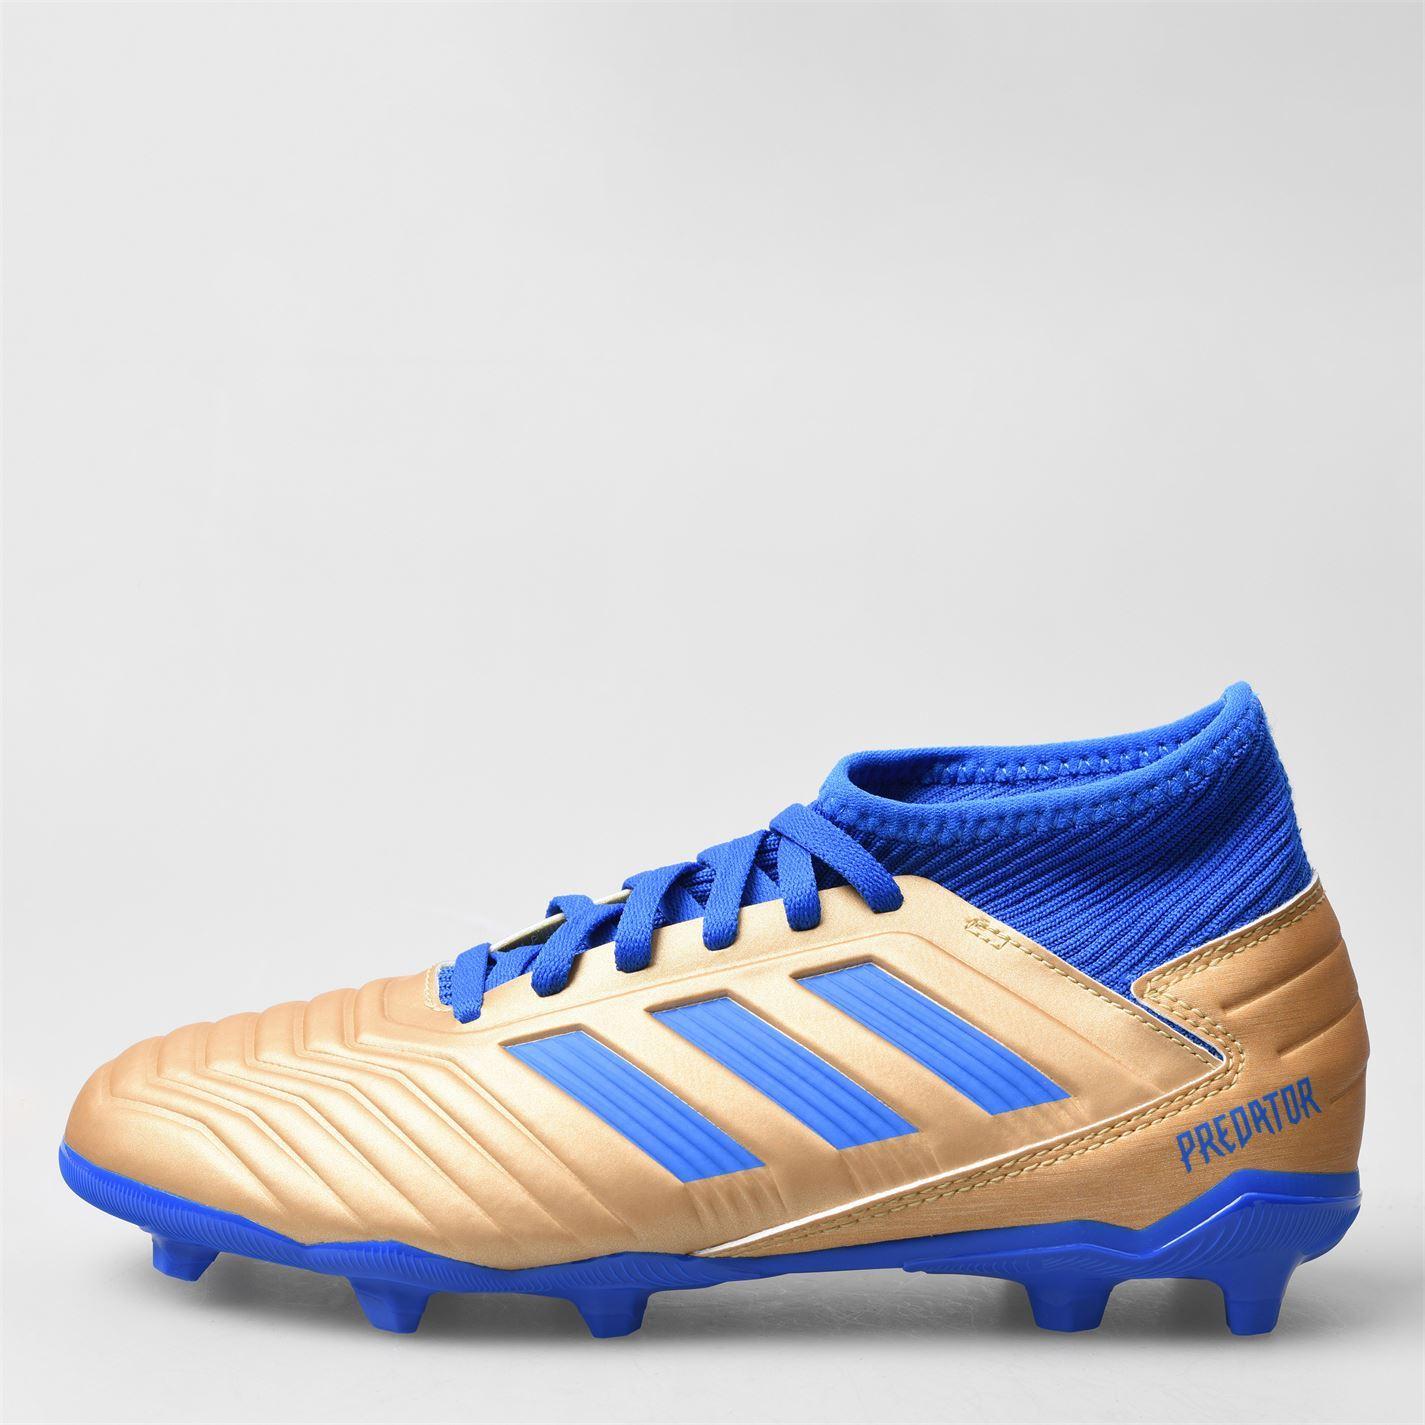 Adidas-Predator-Junior-19-3-FG-Firm-Ground-football-boots-Boys-Football-Chaussures miniature 7